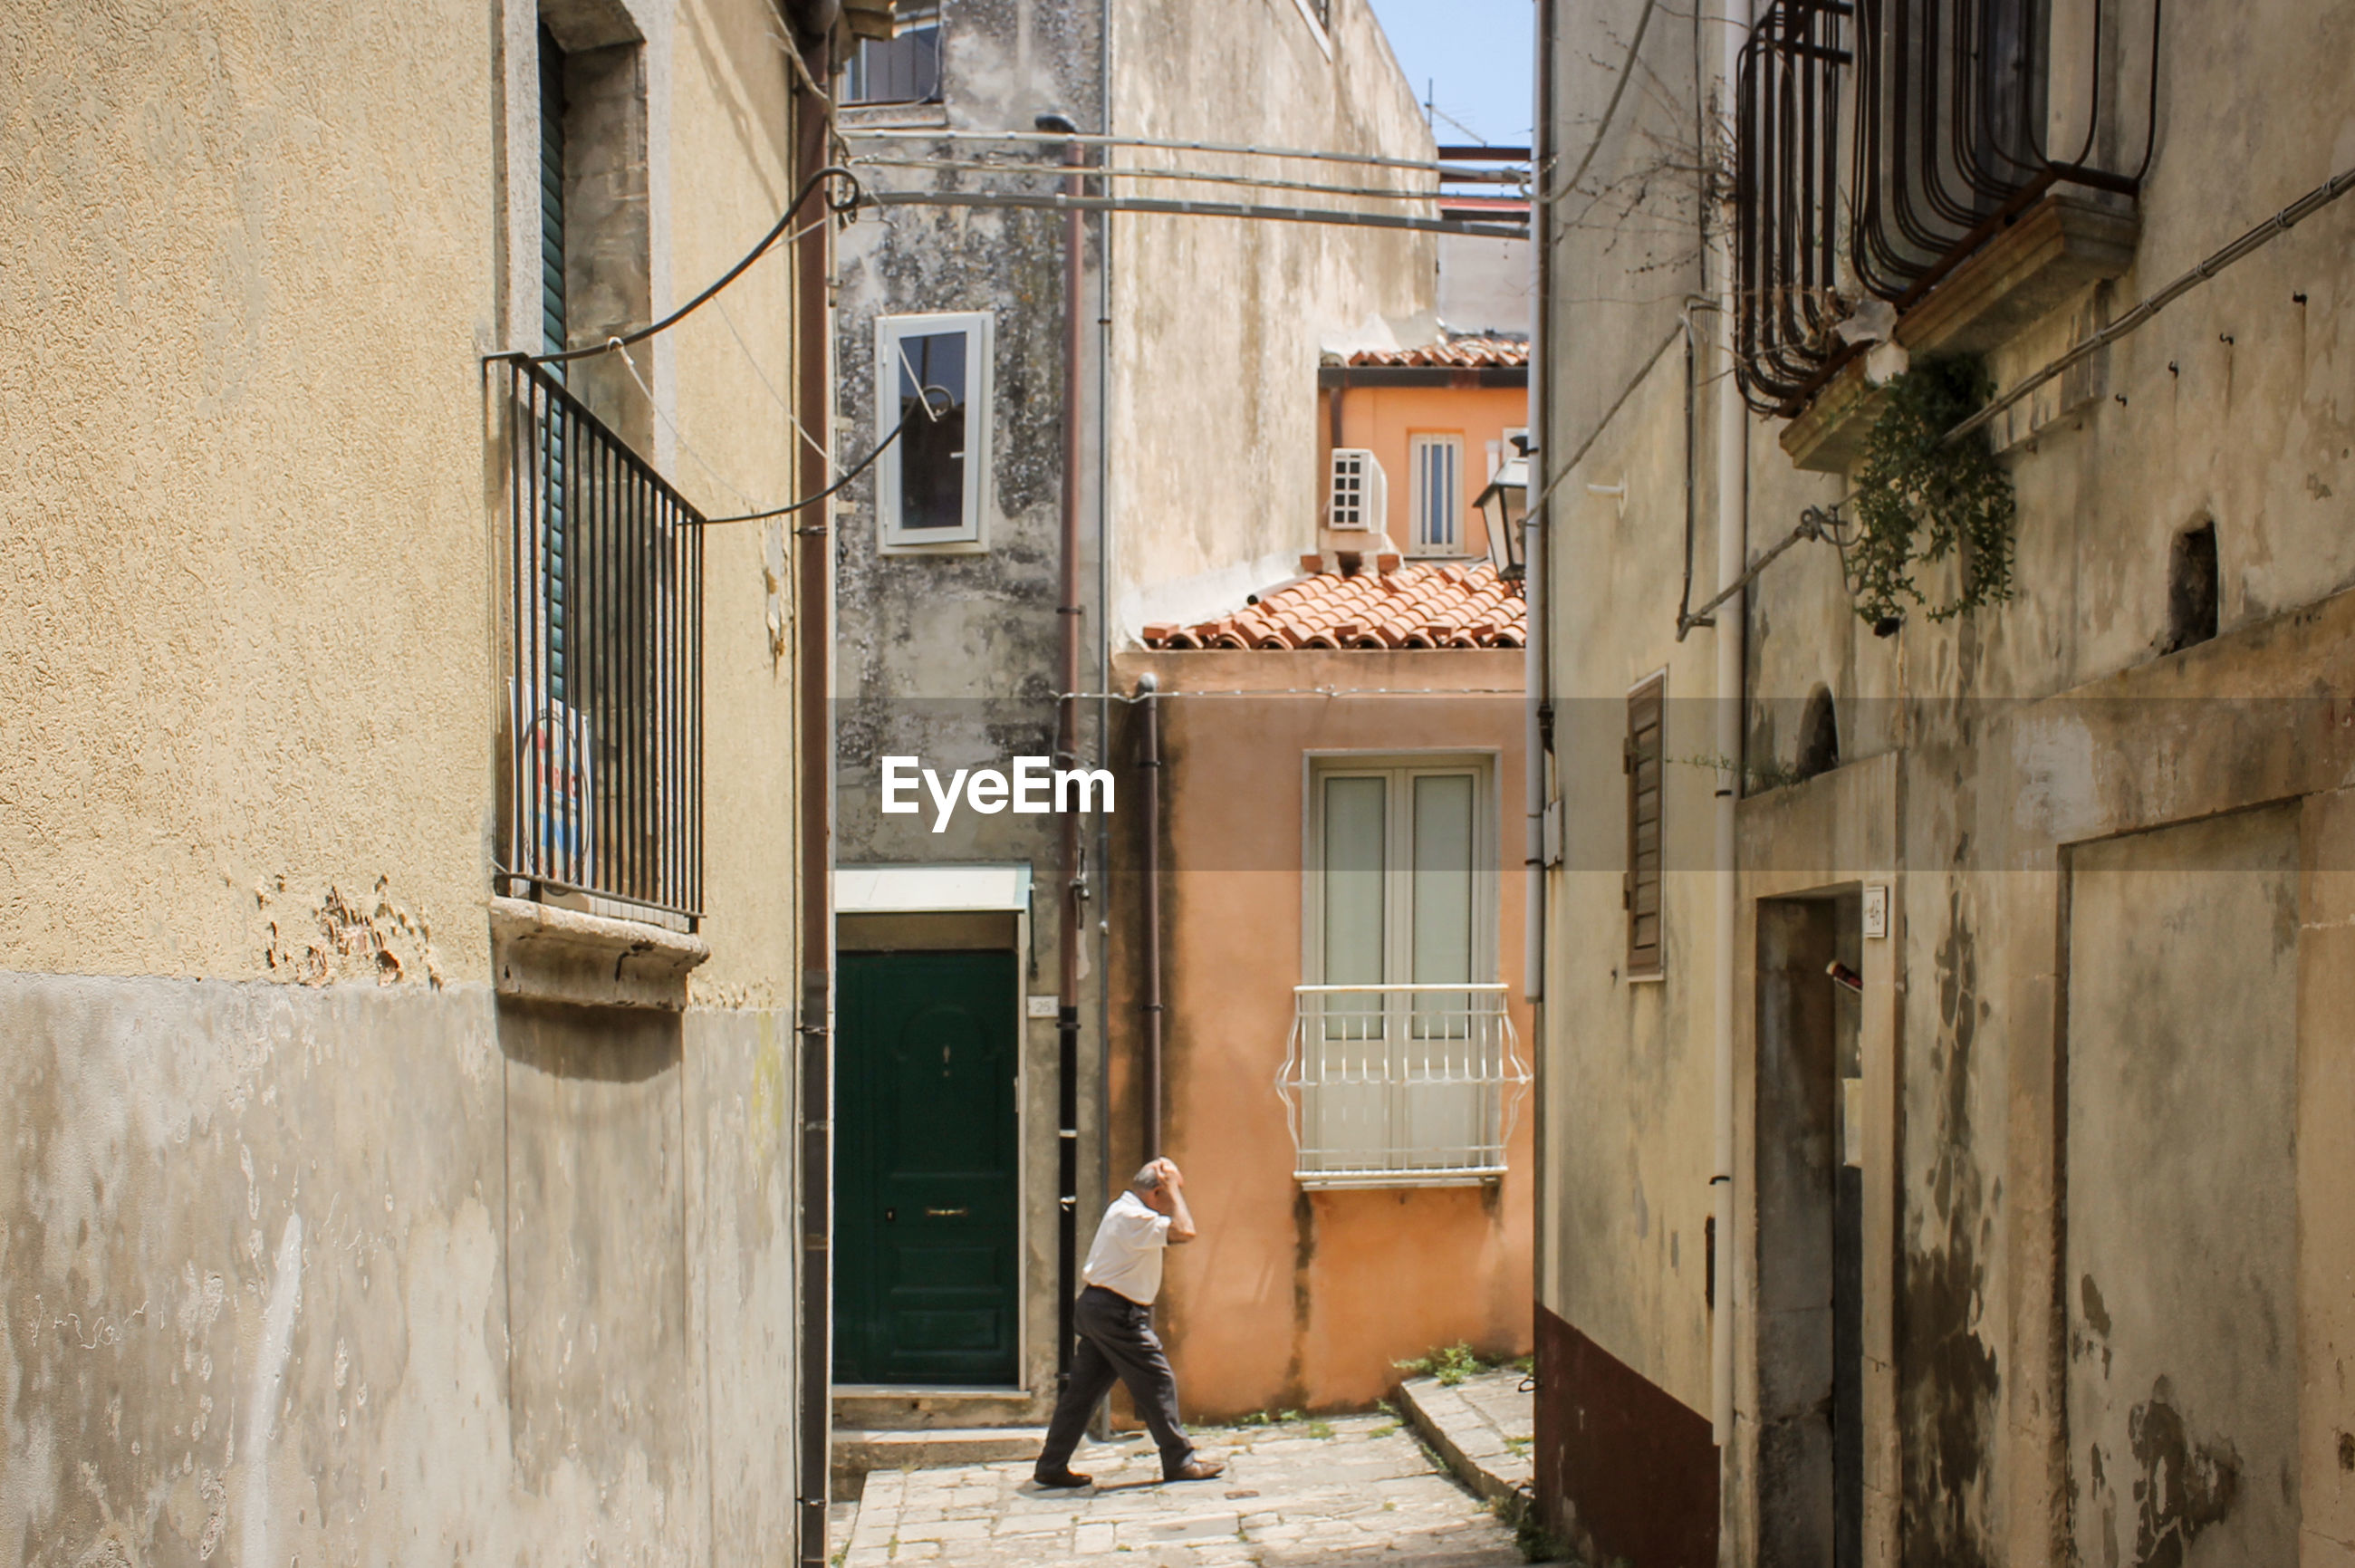 REAR VIEW OF WOMAN WALKING ON STREET AGAINST BUILDINGS